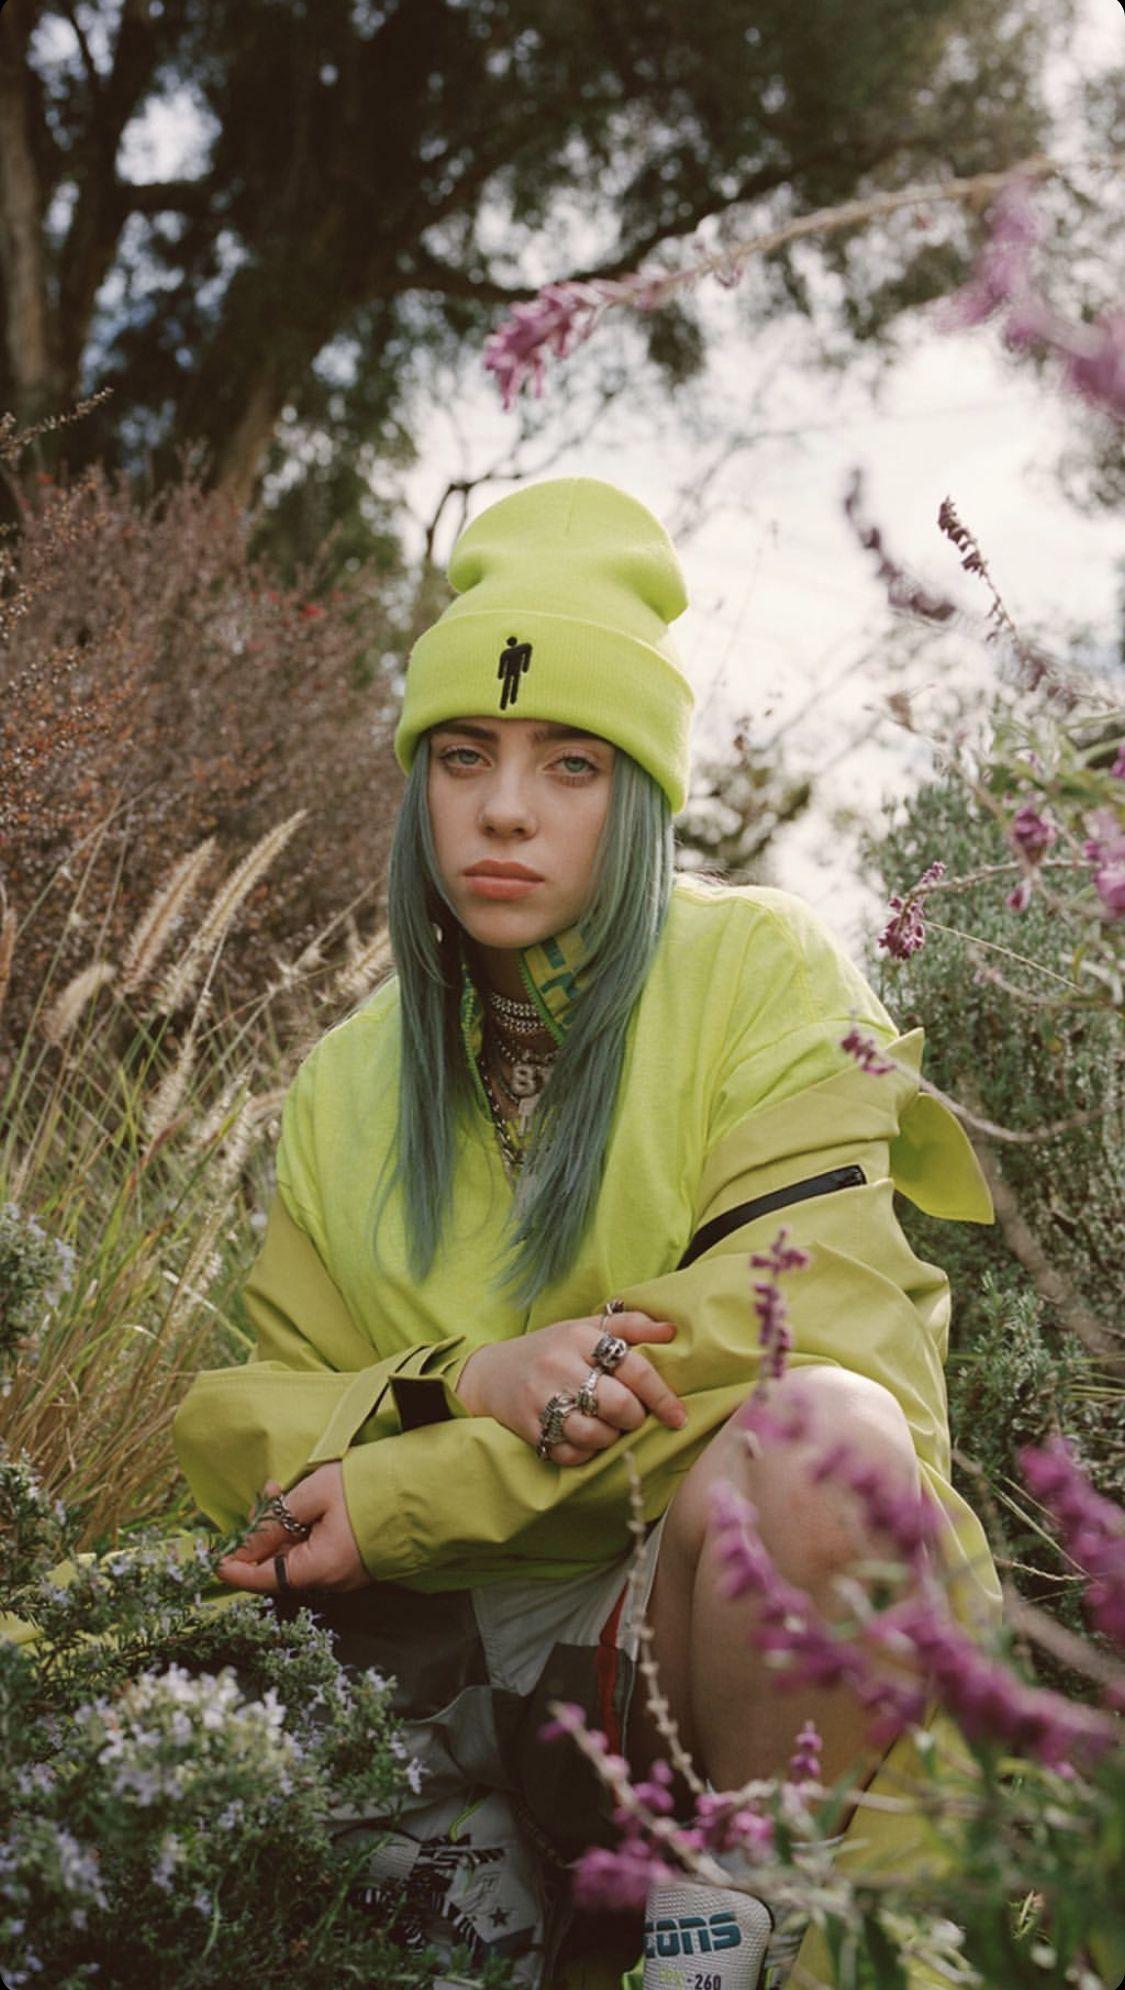 #billieeilish #aesthetic billie eilish #green